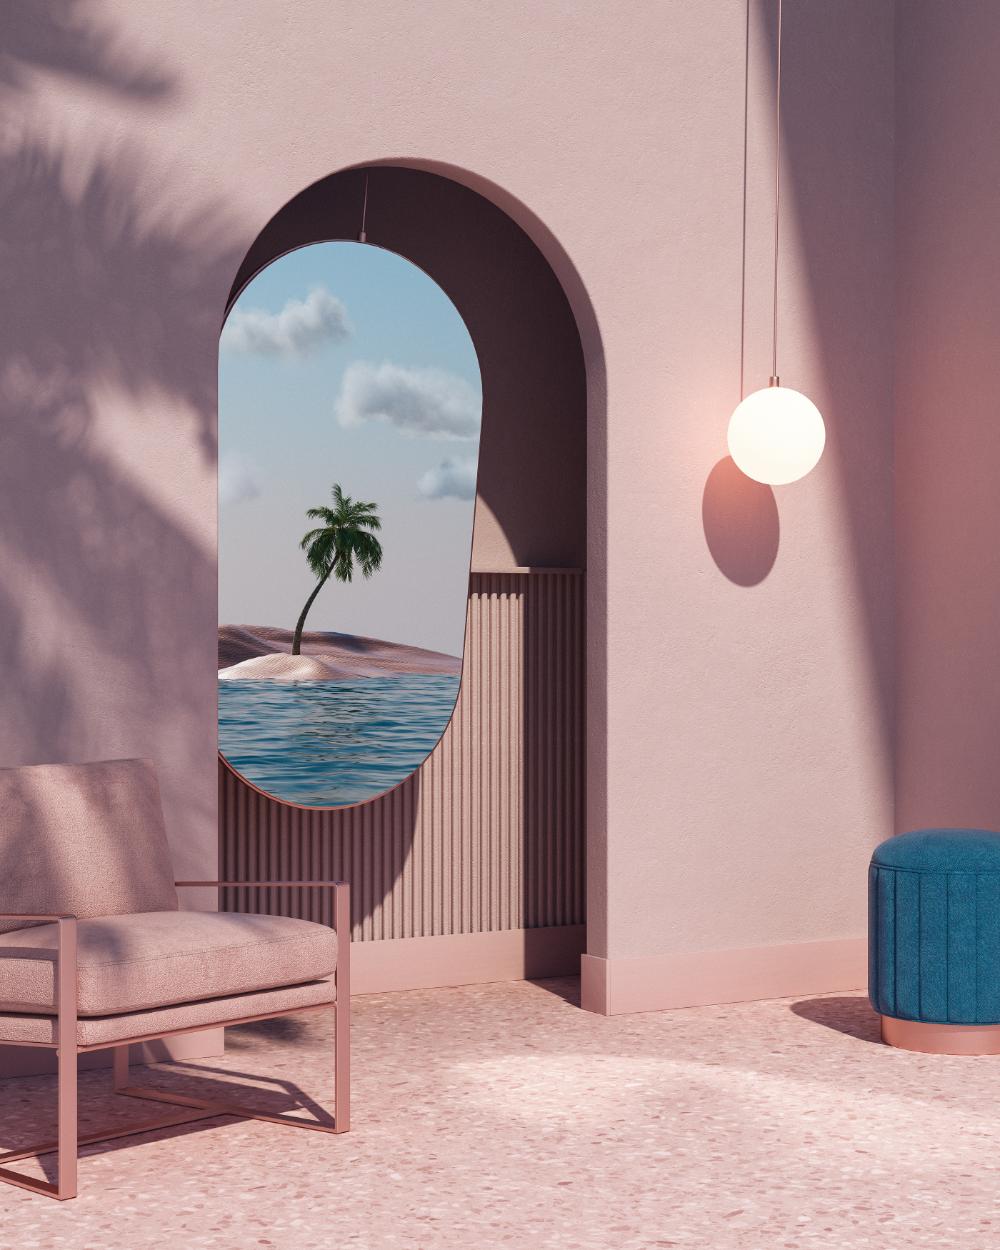 Isolation Reflections on Behance | Interior design art ...